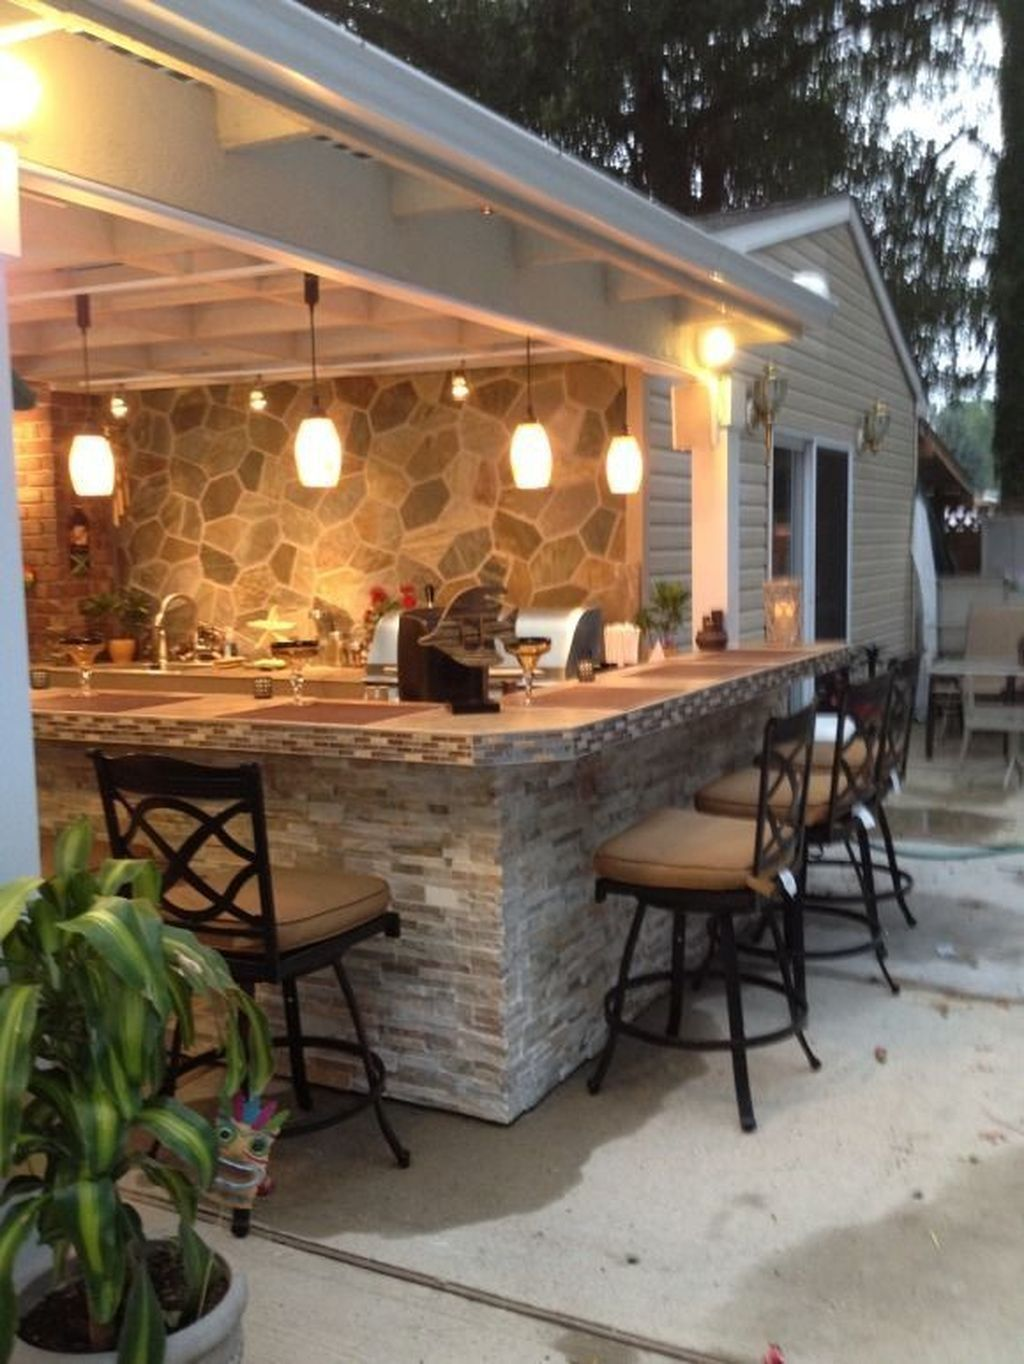 30+ Adorable Outdoor Kitchen Ideas Let You Enjoy Your ...